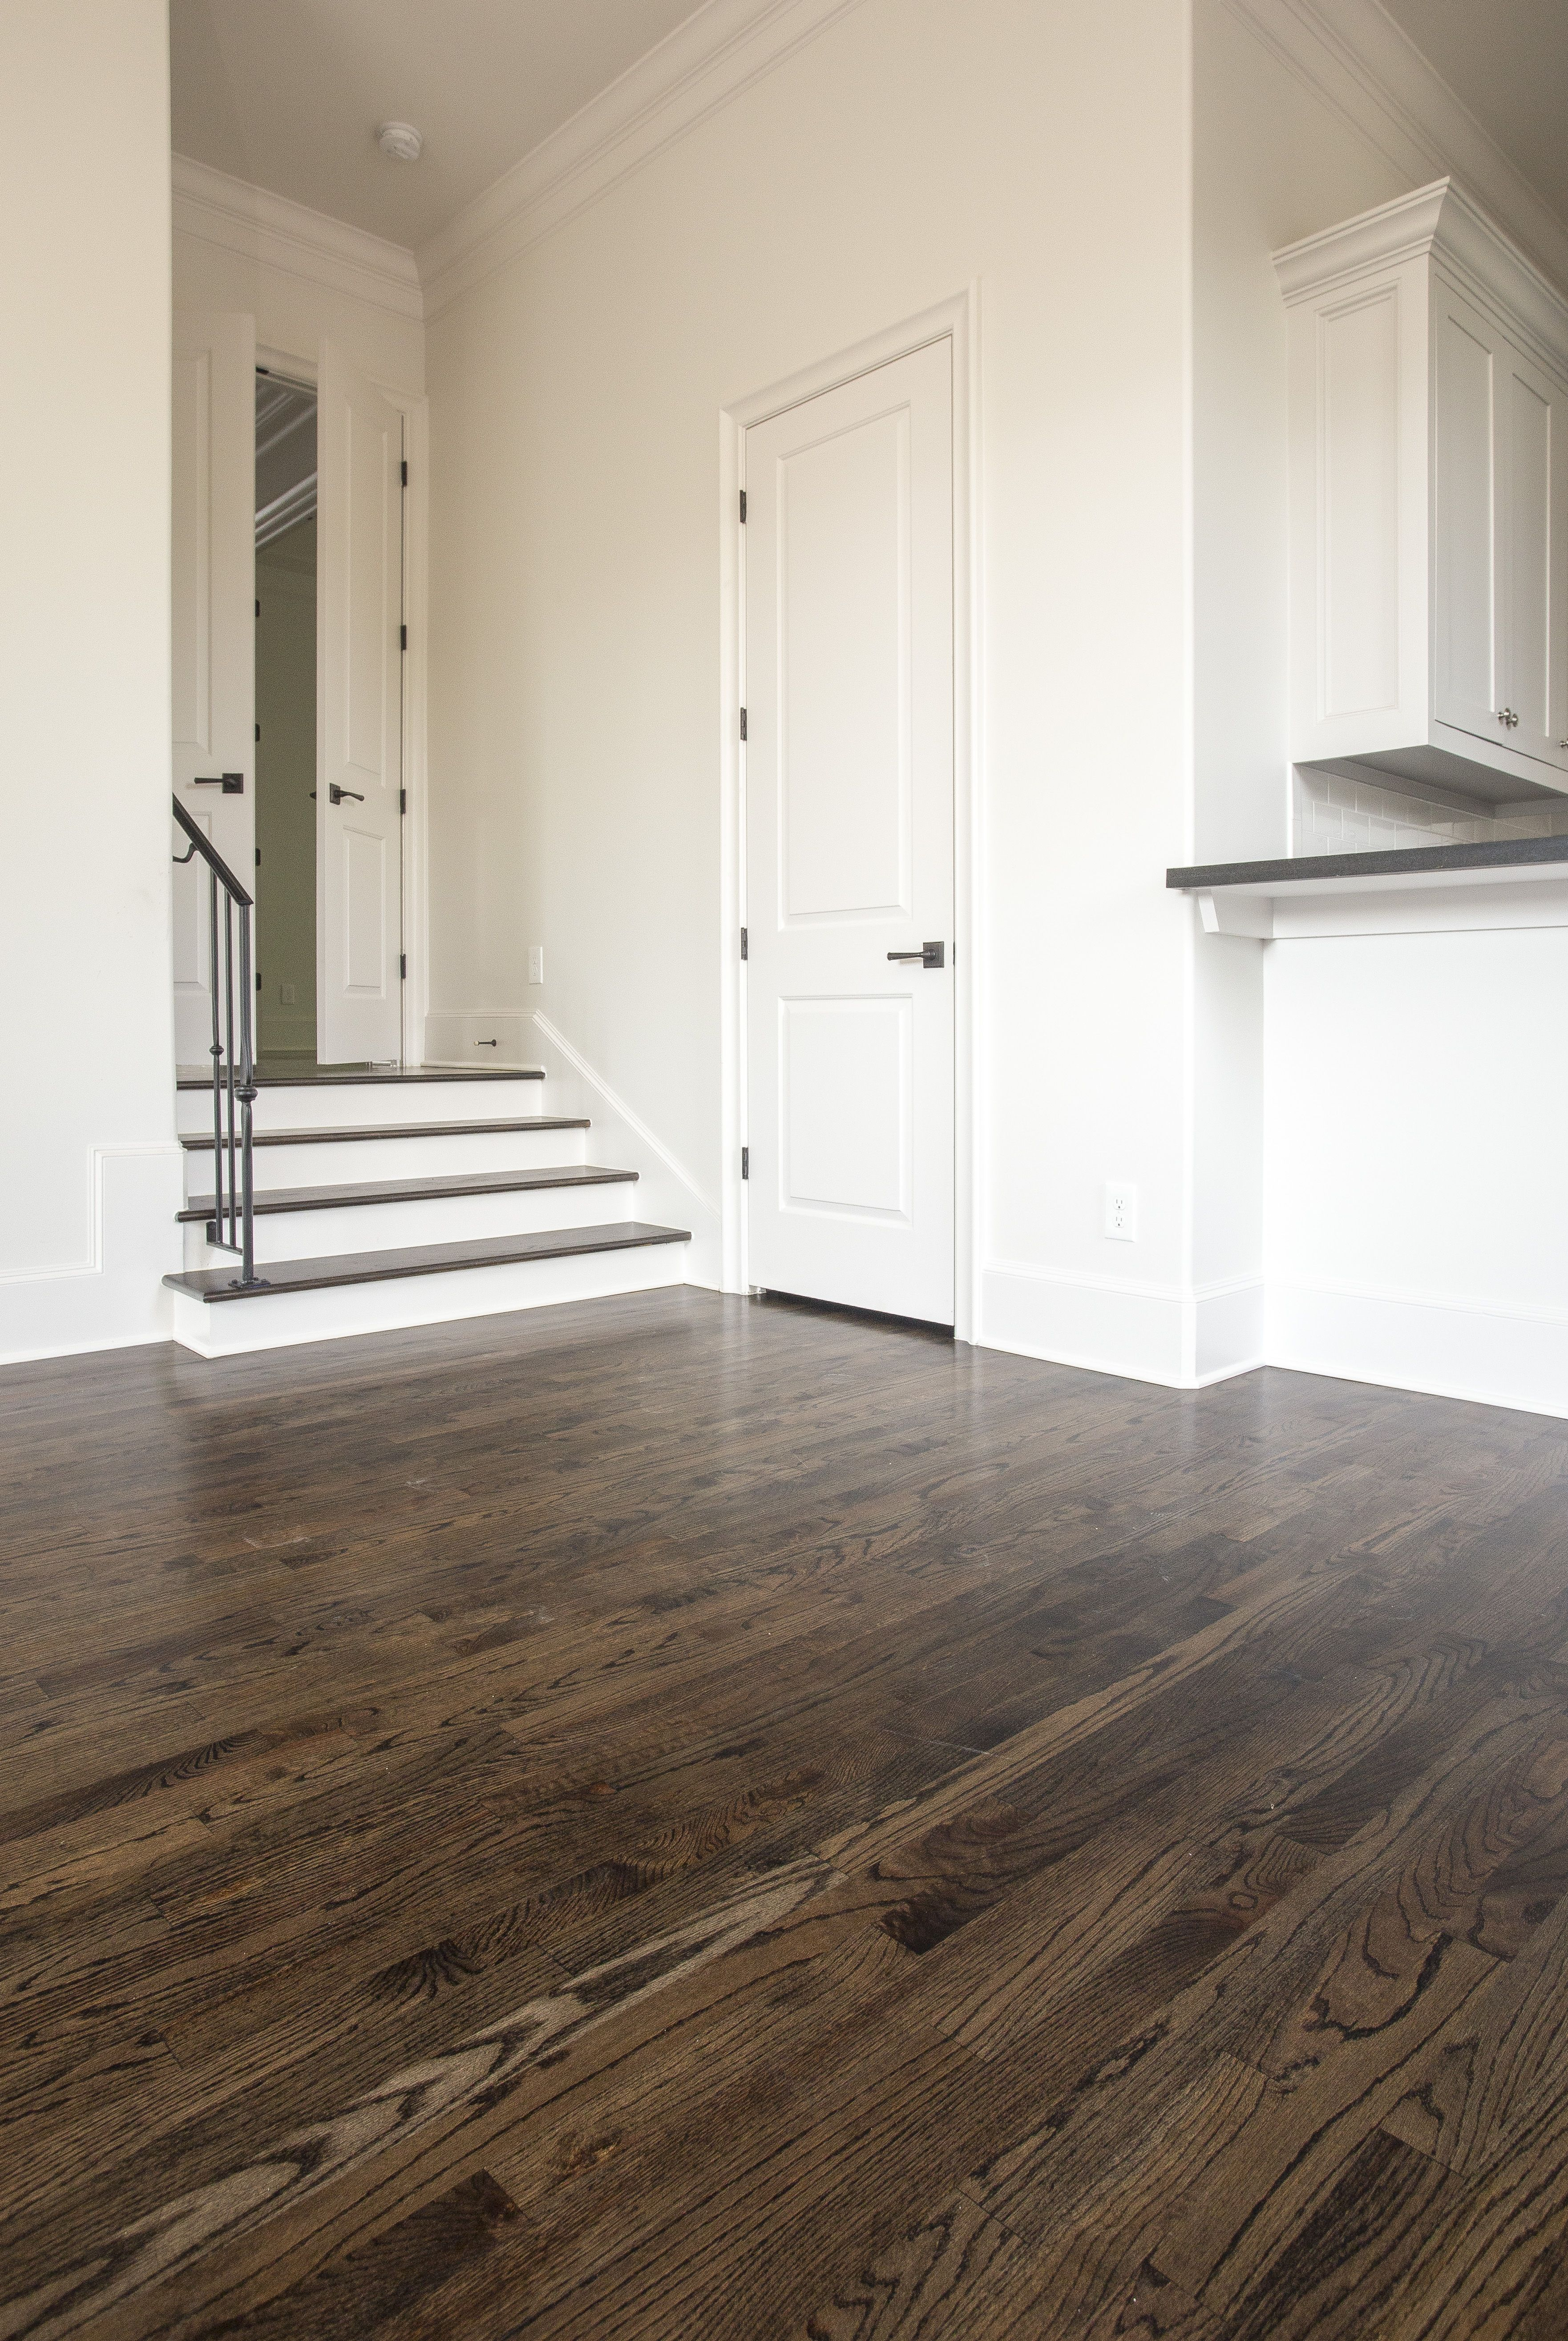 3 4 X 2 1 4 Solid No 1 Common Red Oak Hardwood Floors Hardwood Red Oak